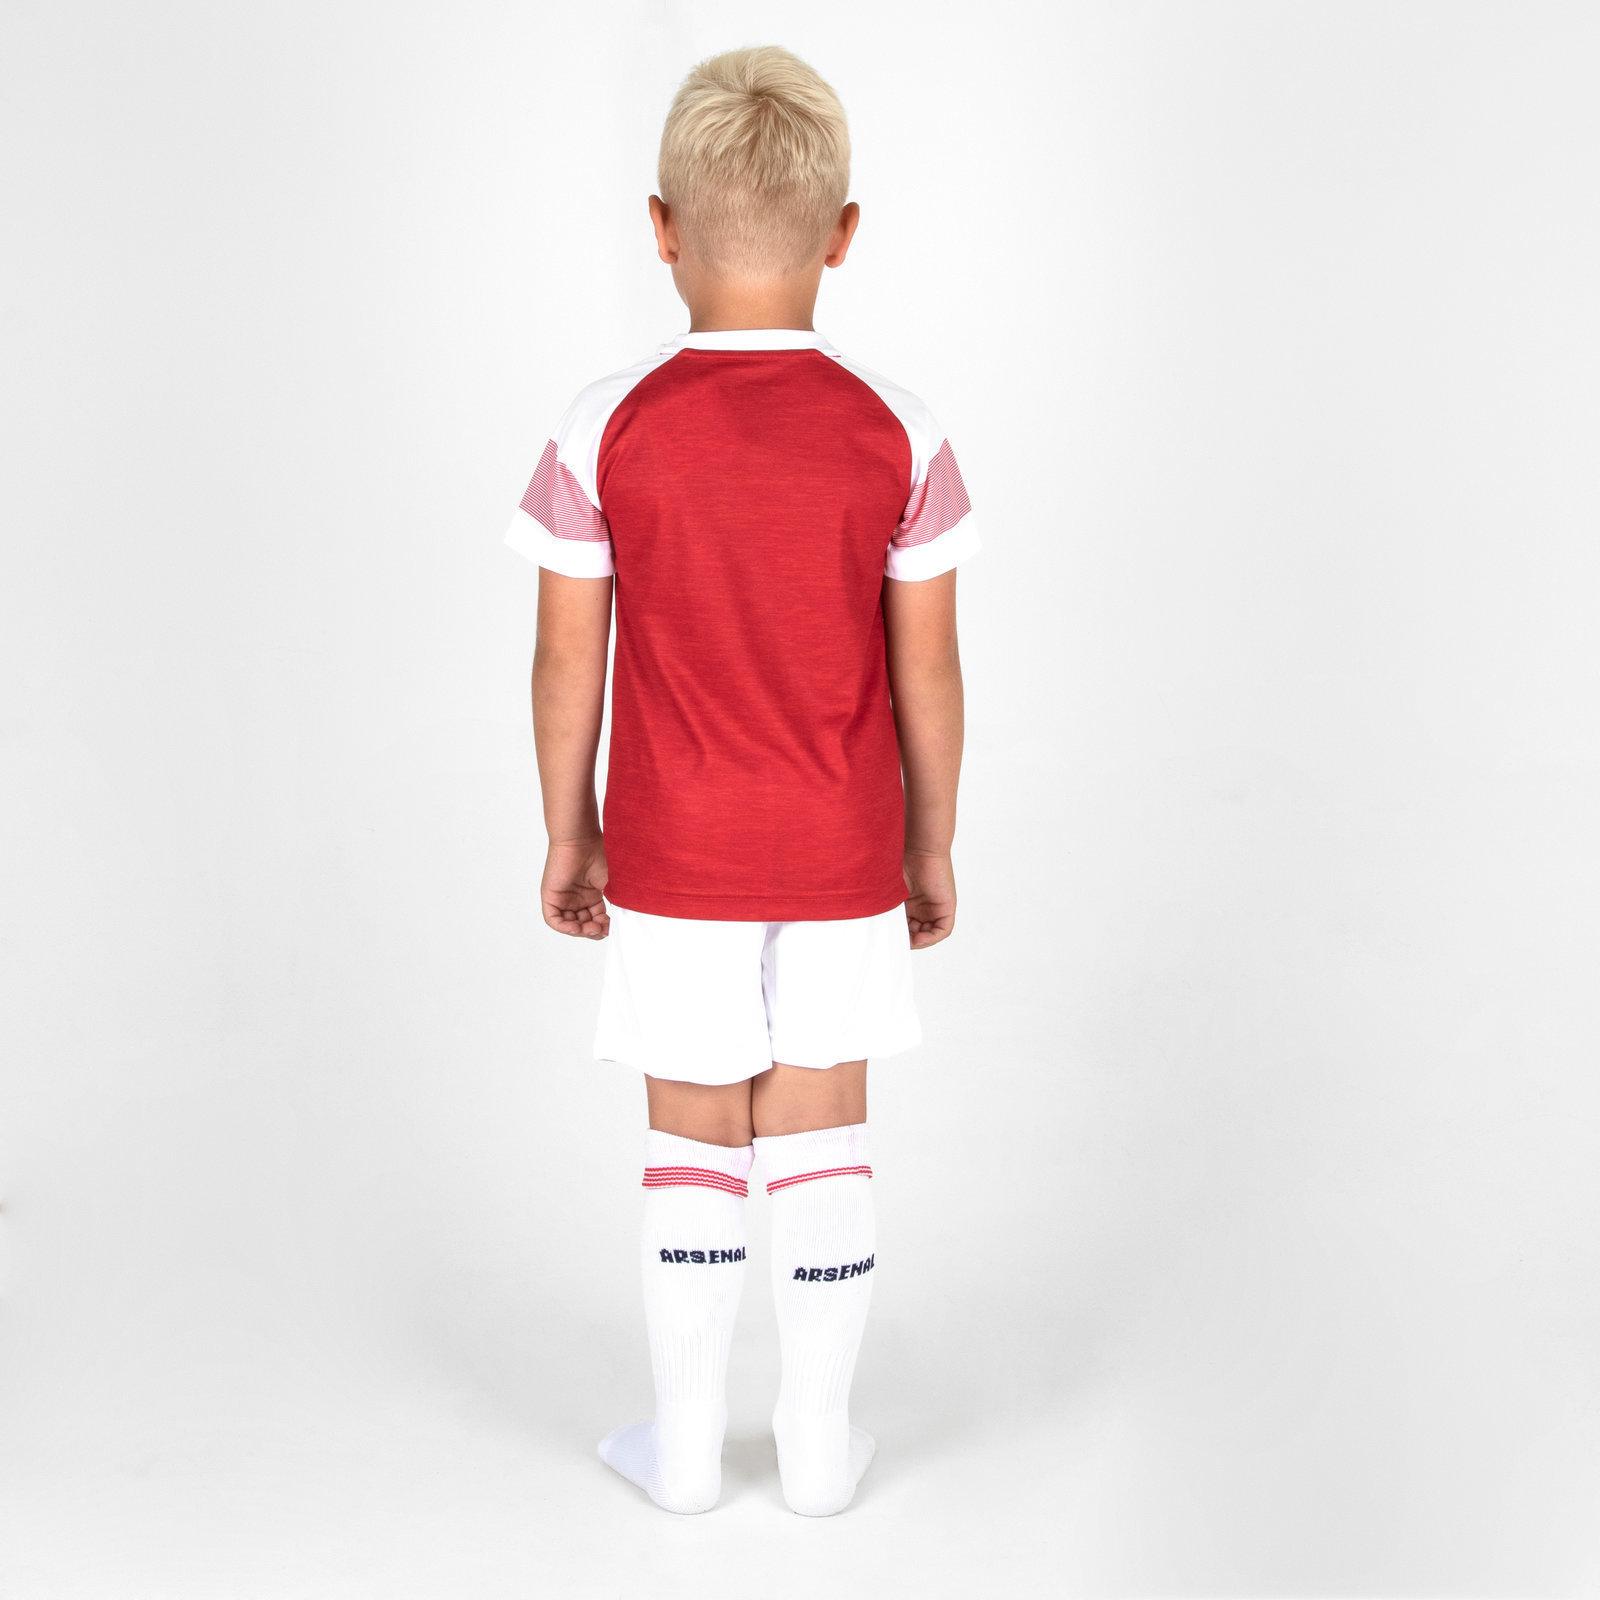 3817e8ba6ed Puma Arsenal 18 19 Home Mini Kids Football Kit Red Sports Training ...